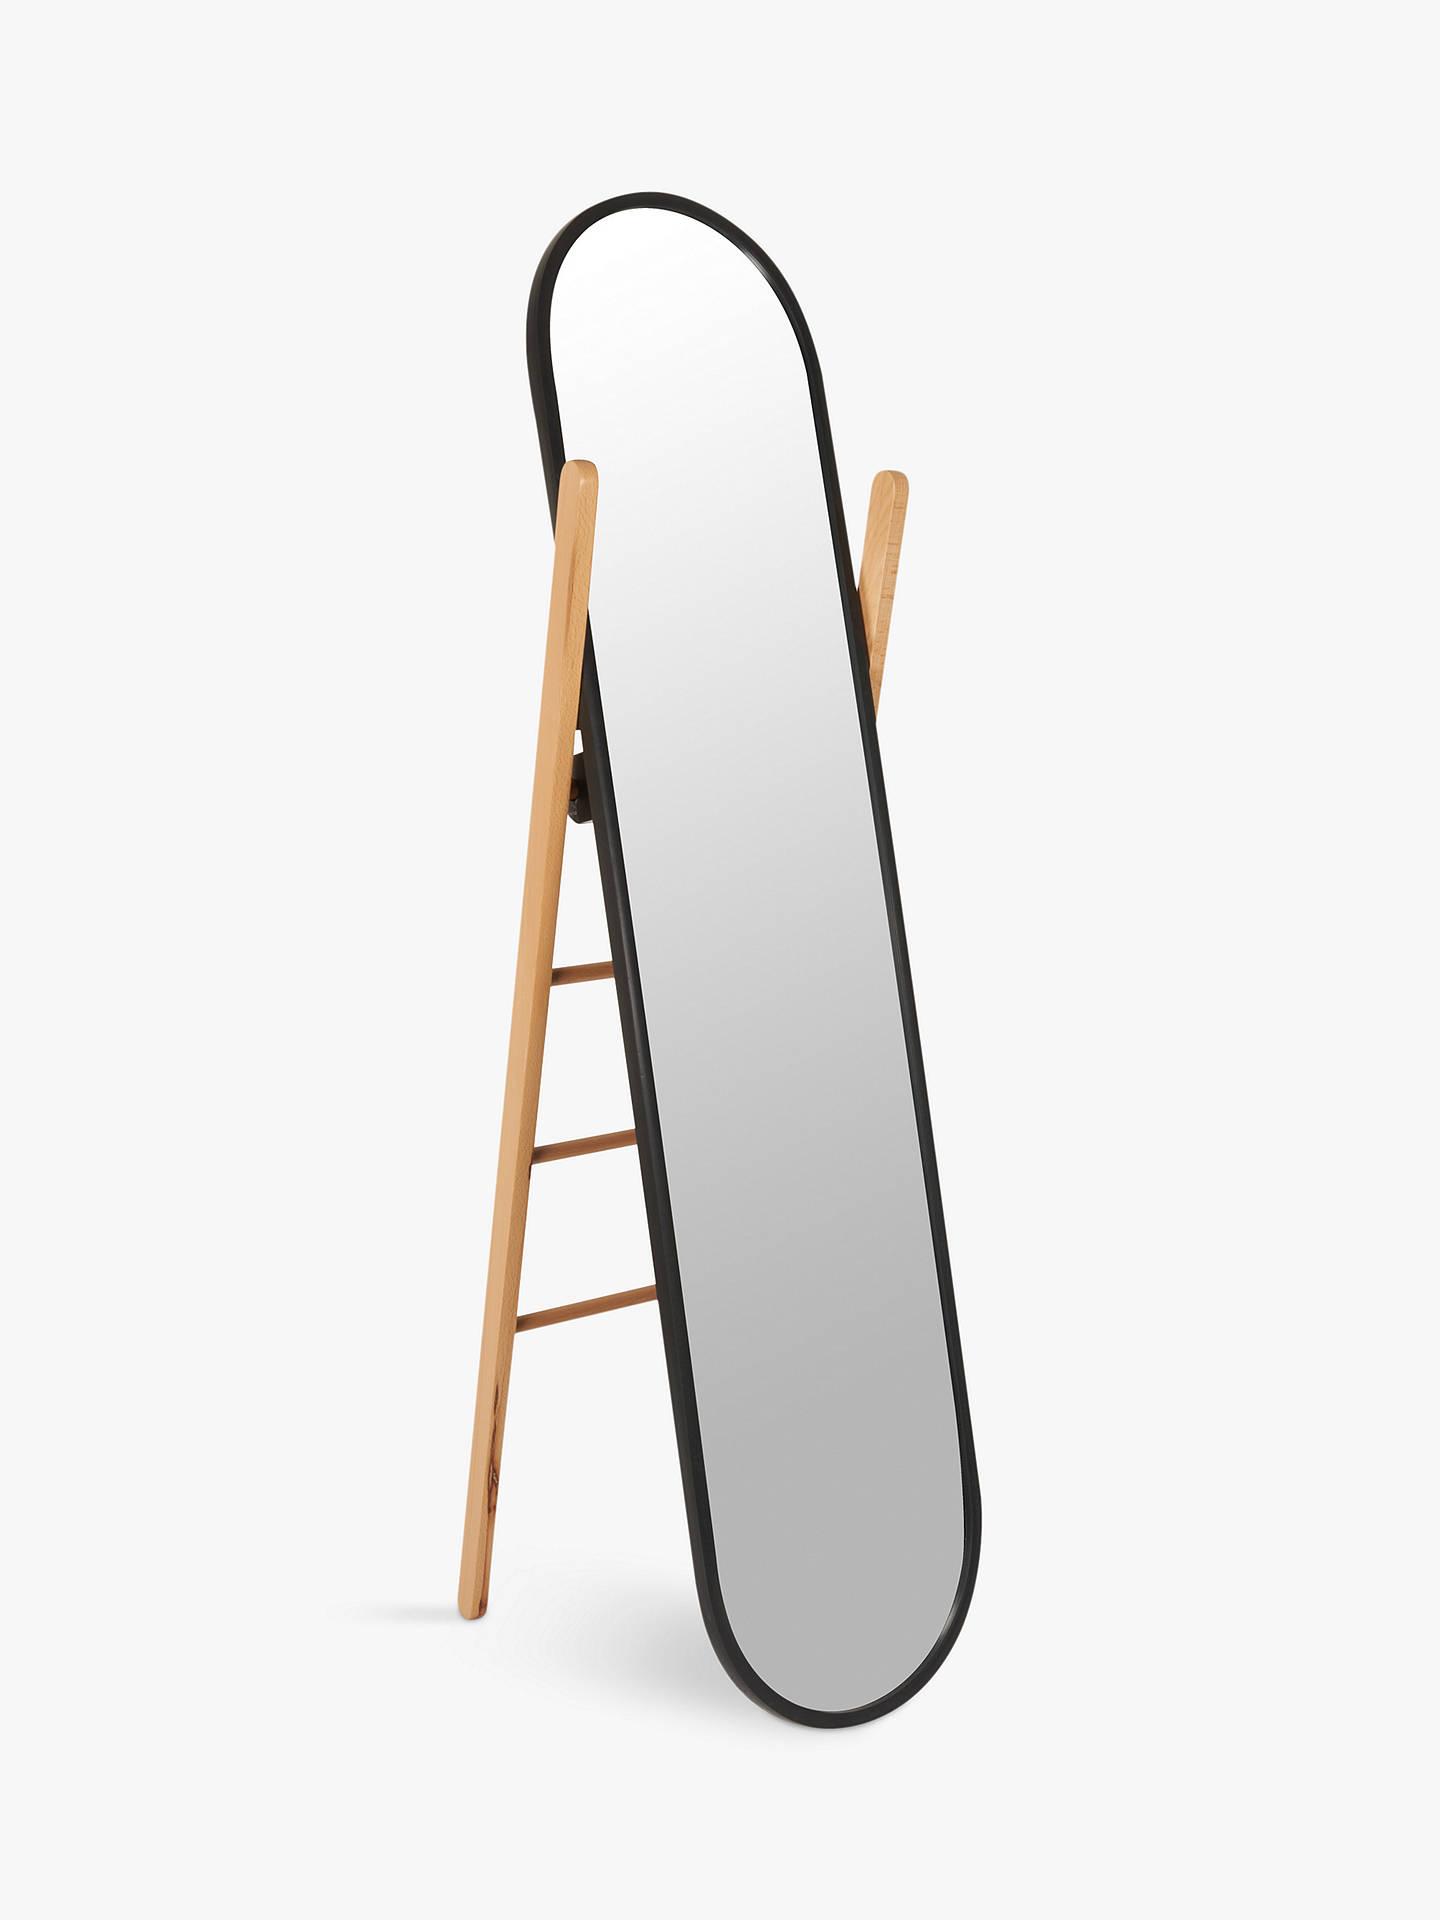 Umbra Hub Cheval Mirror, 158 X 58.5cm, Black by Umbra